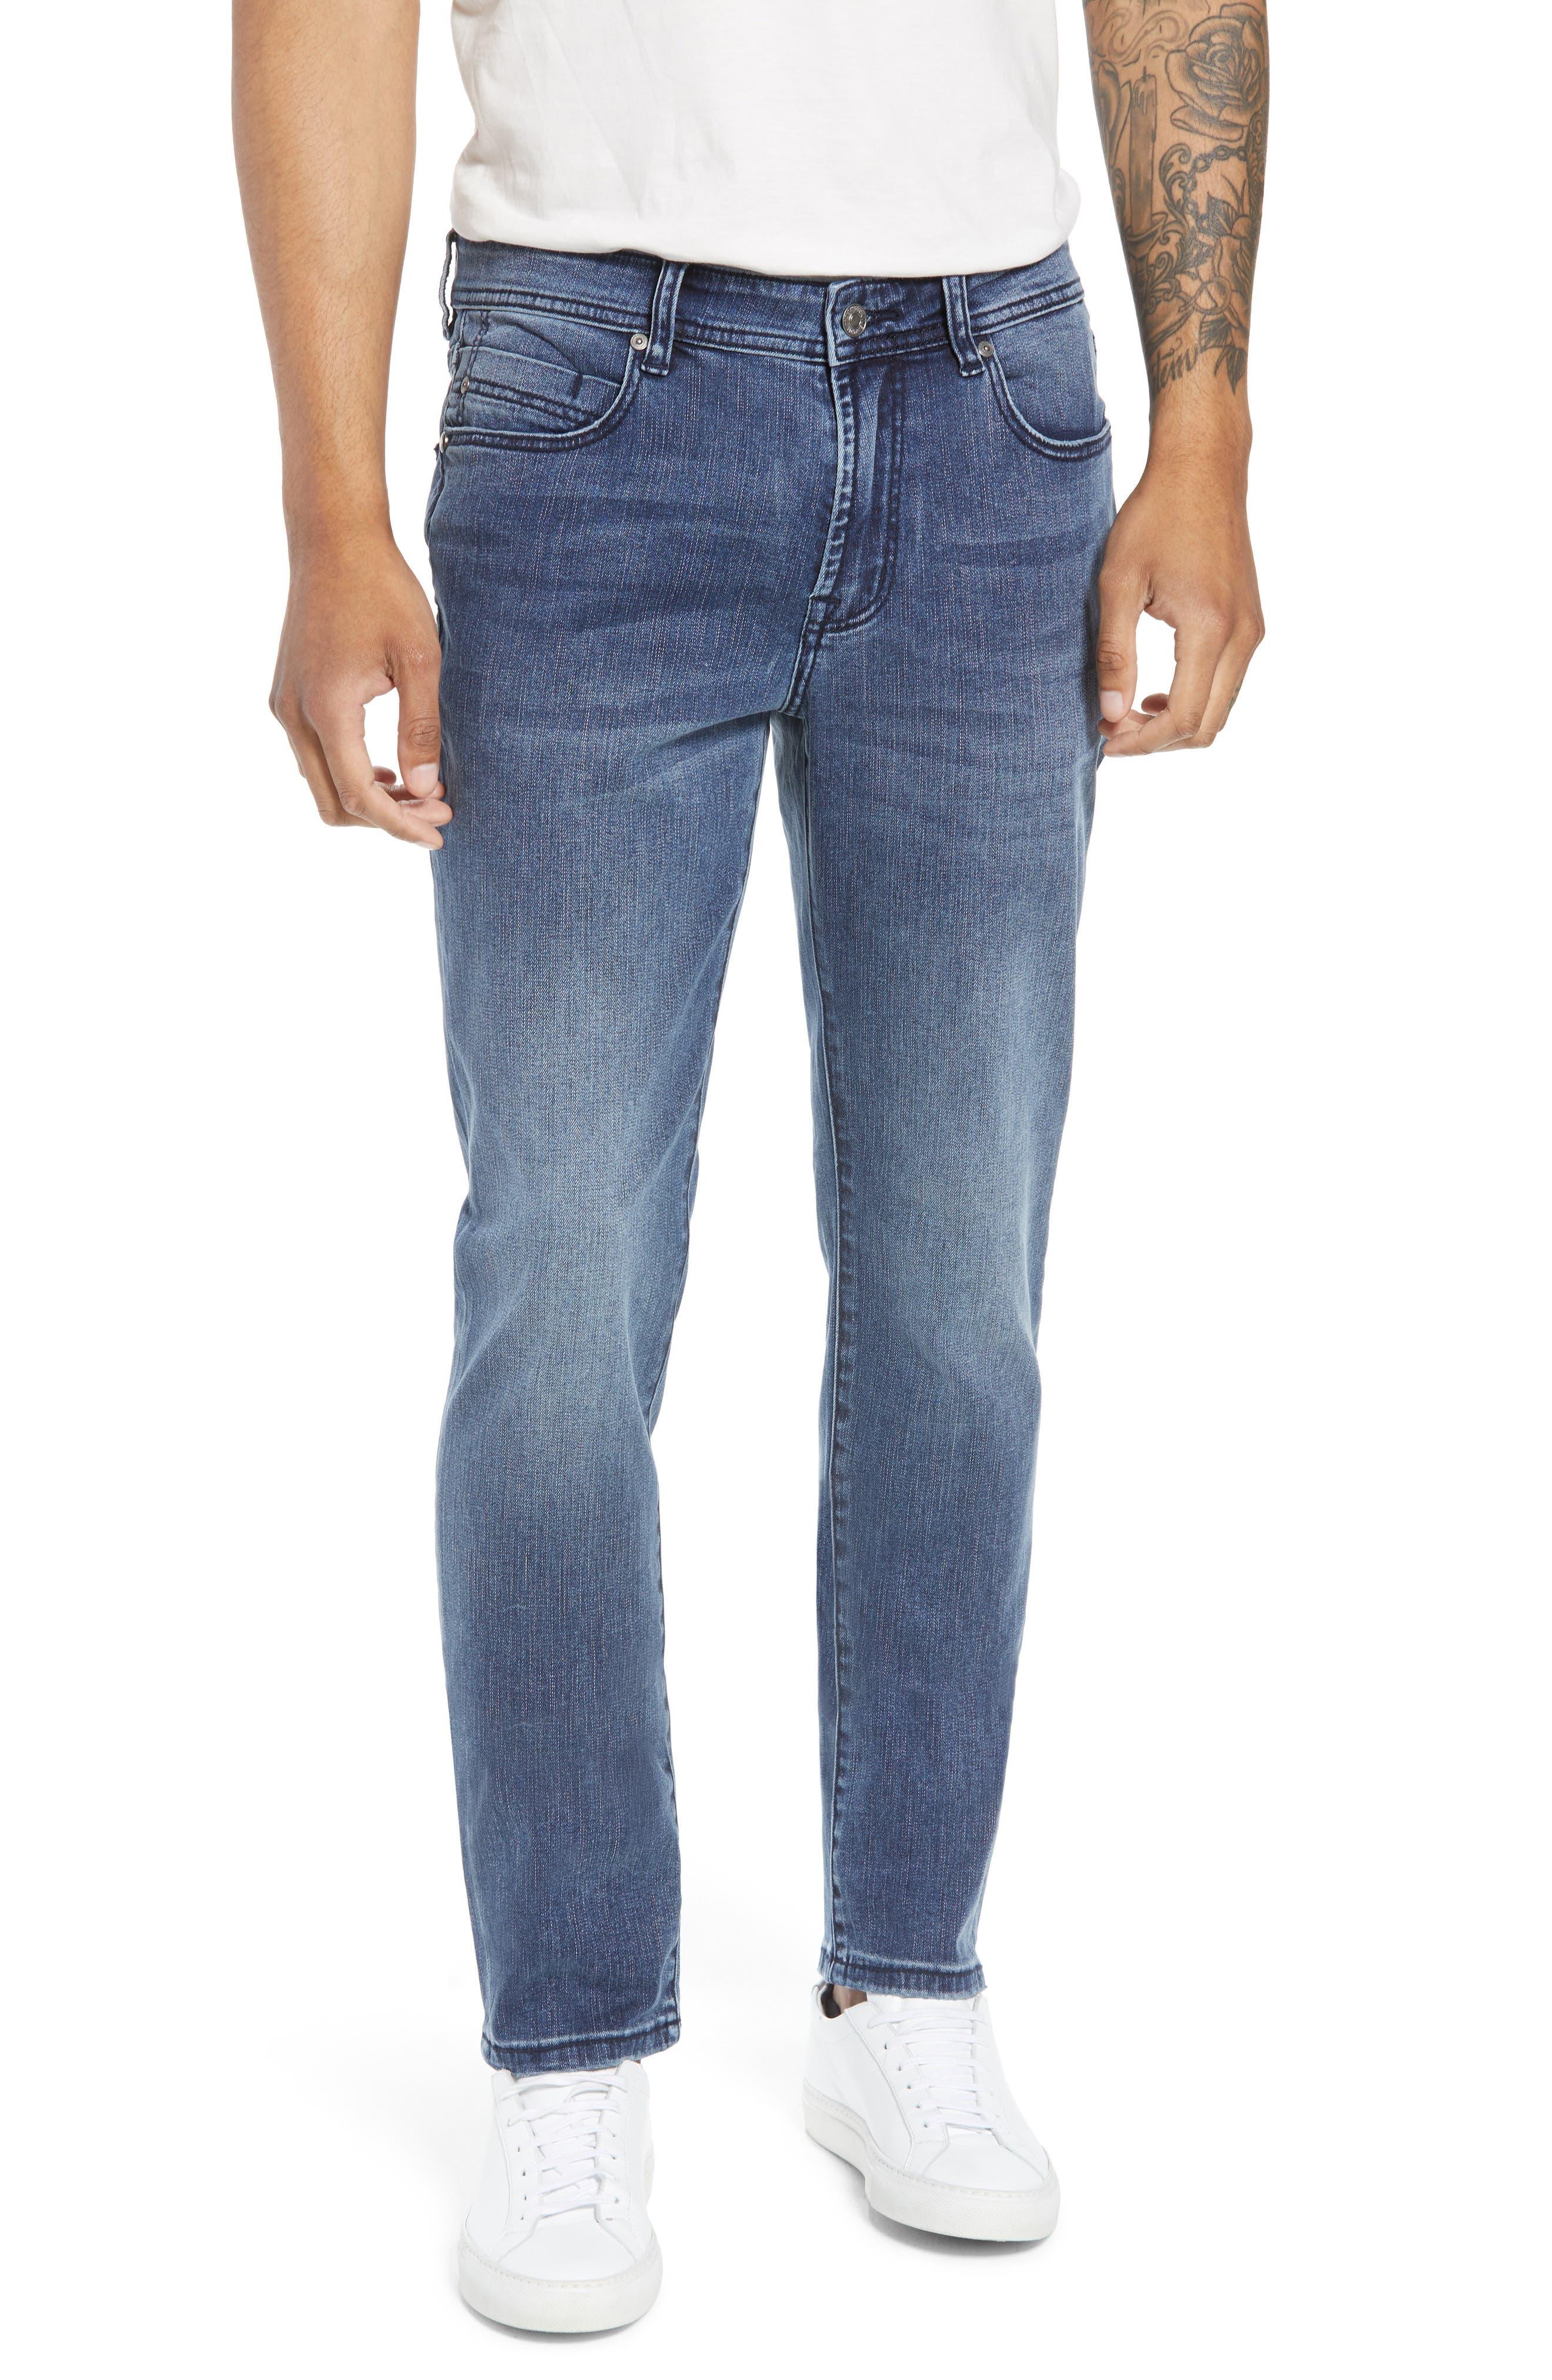 Jeans Co. Slim Straight Leg Jeans,                             Main thumbnail 1, color,                             Southaven Mid Blue